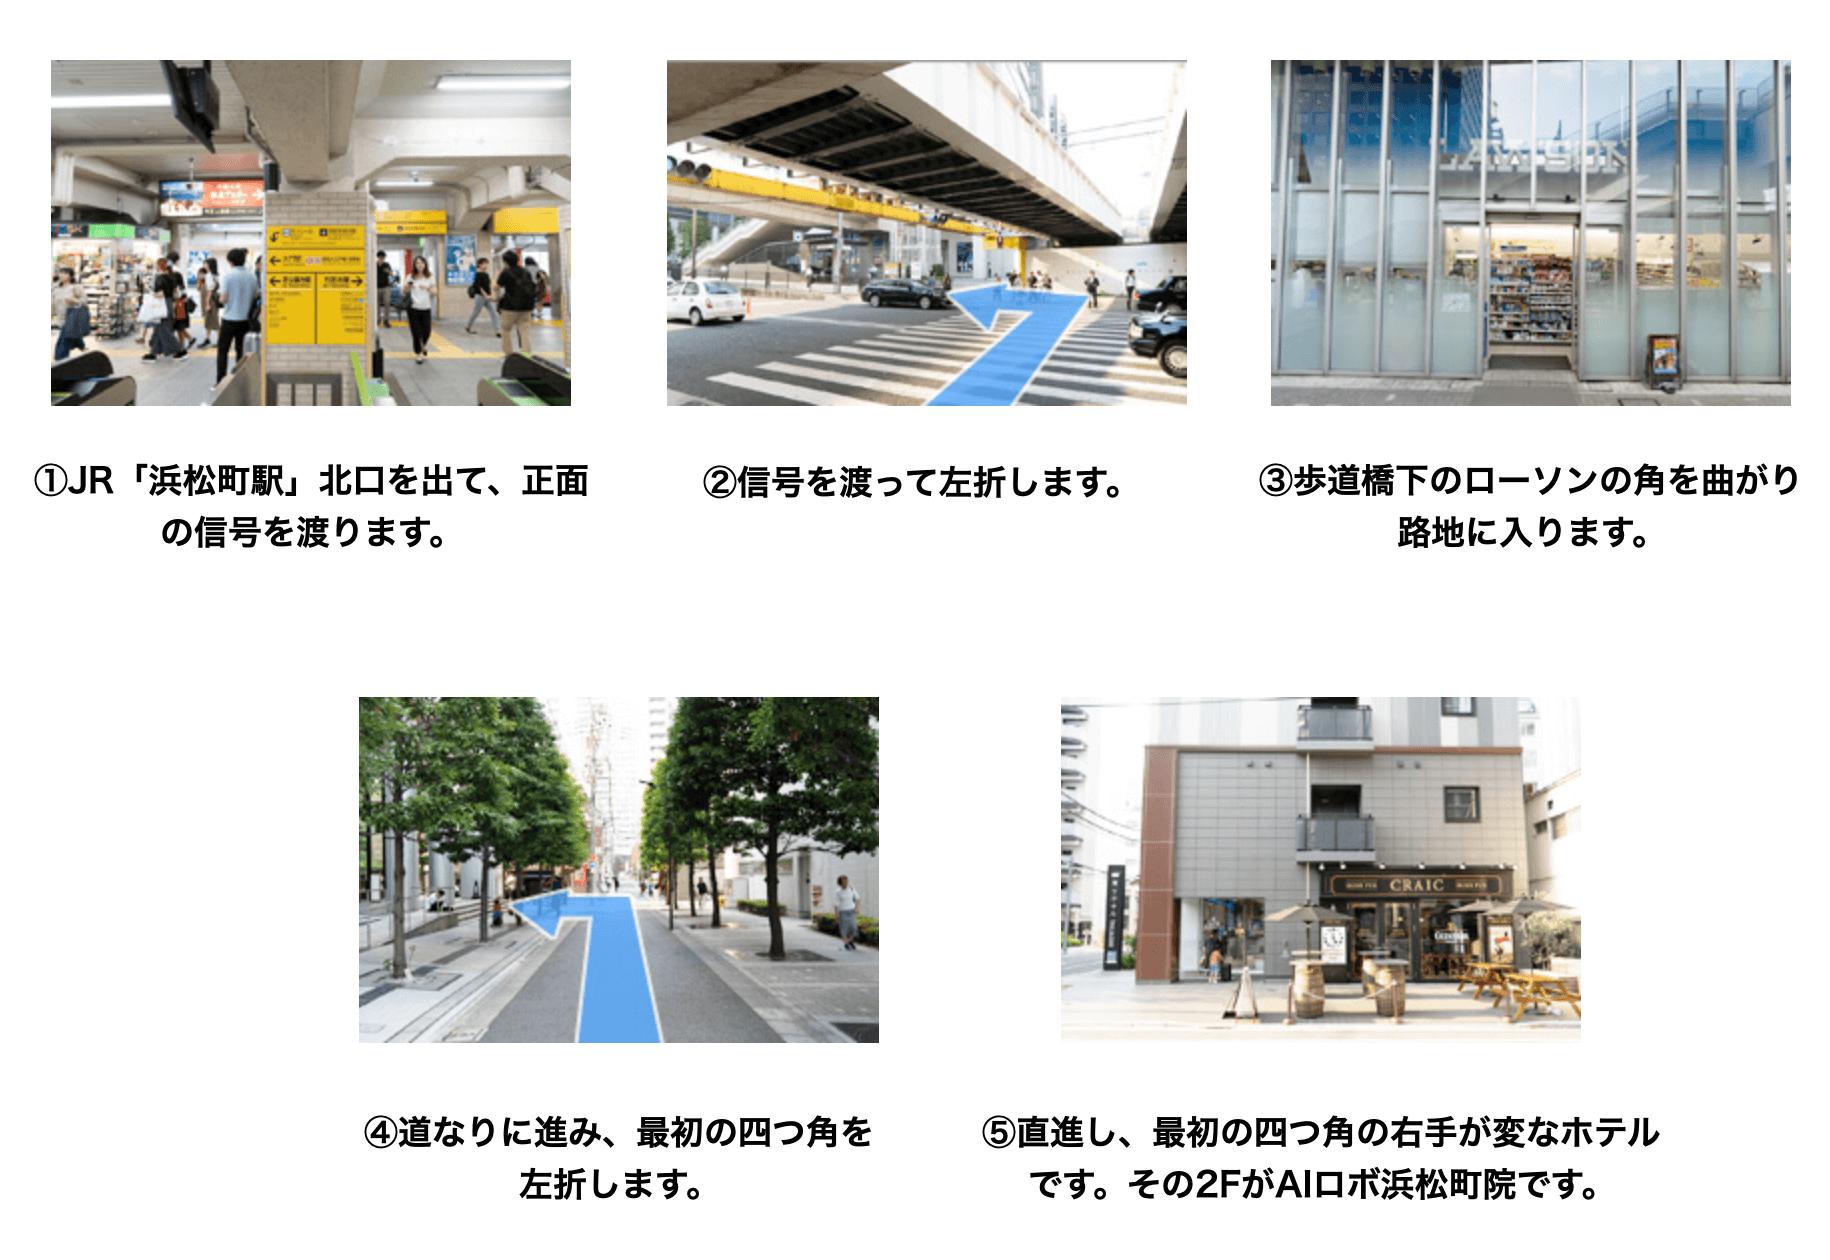 AGAスキンクリニックAIロボ浜松町院に迷わず辿り着くための完全MAP(浜松町駅からのアクセス)